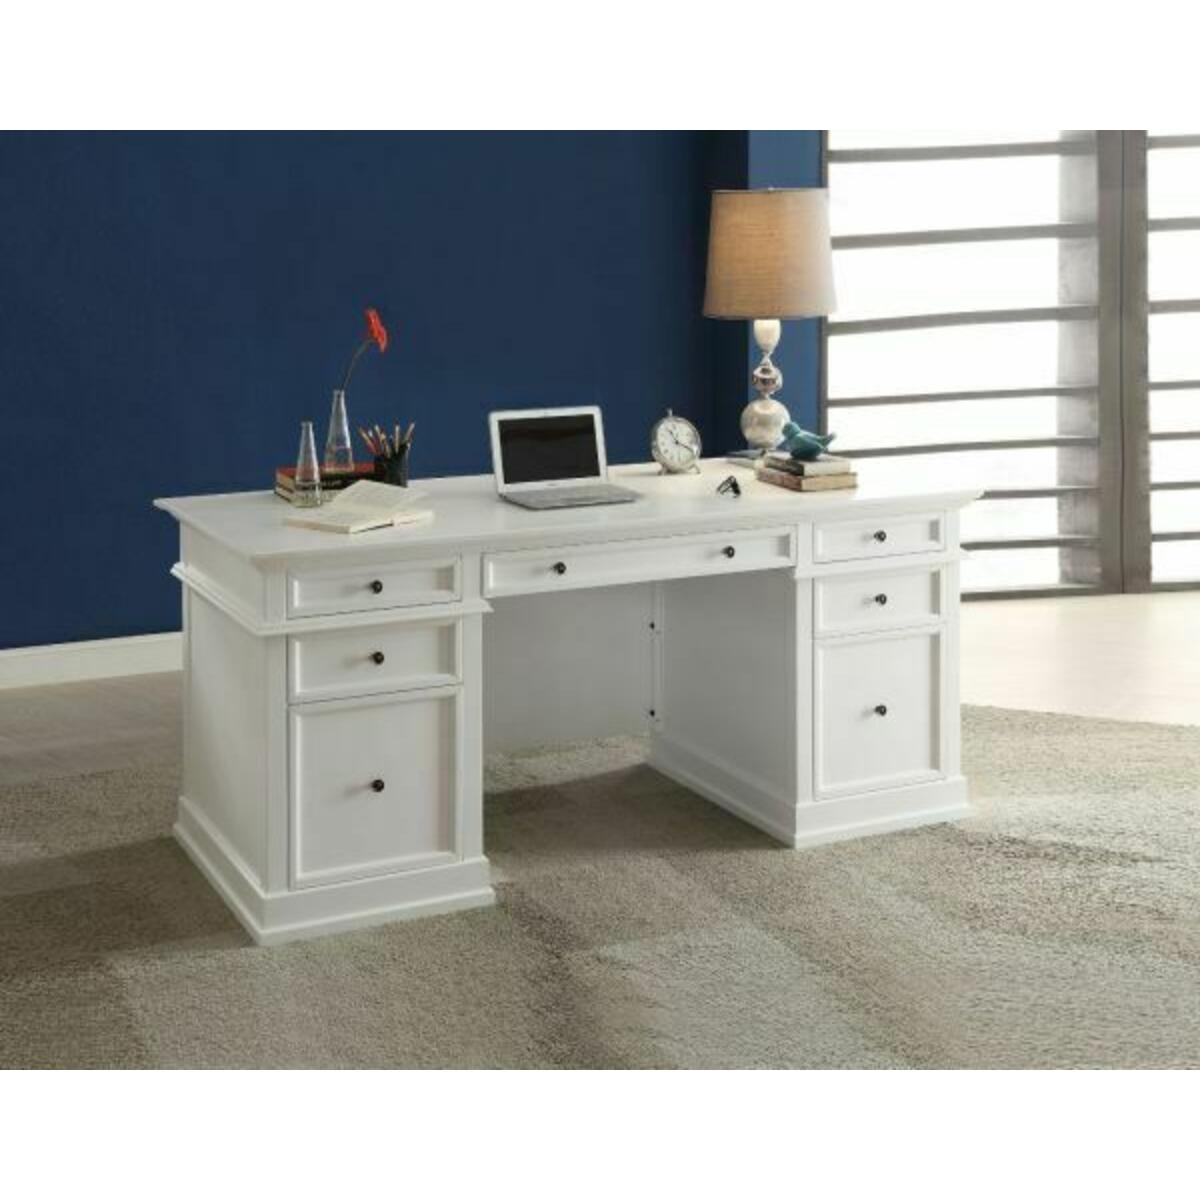 ACME Pandora Corner Desk - 92266 - Black